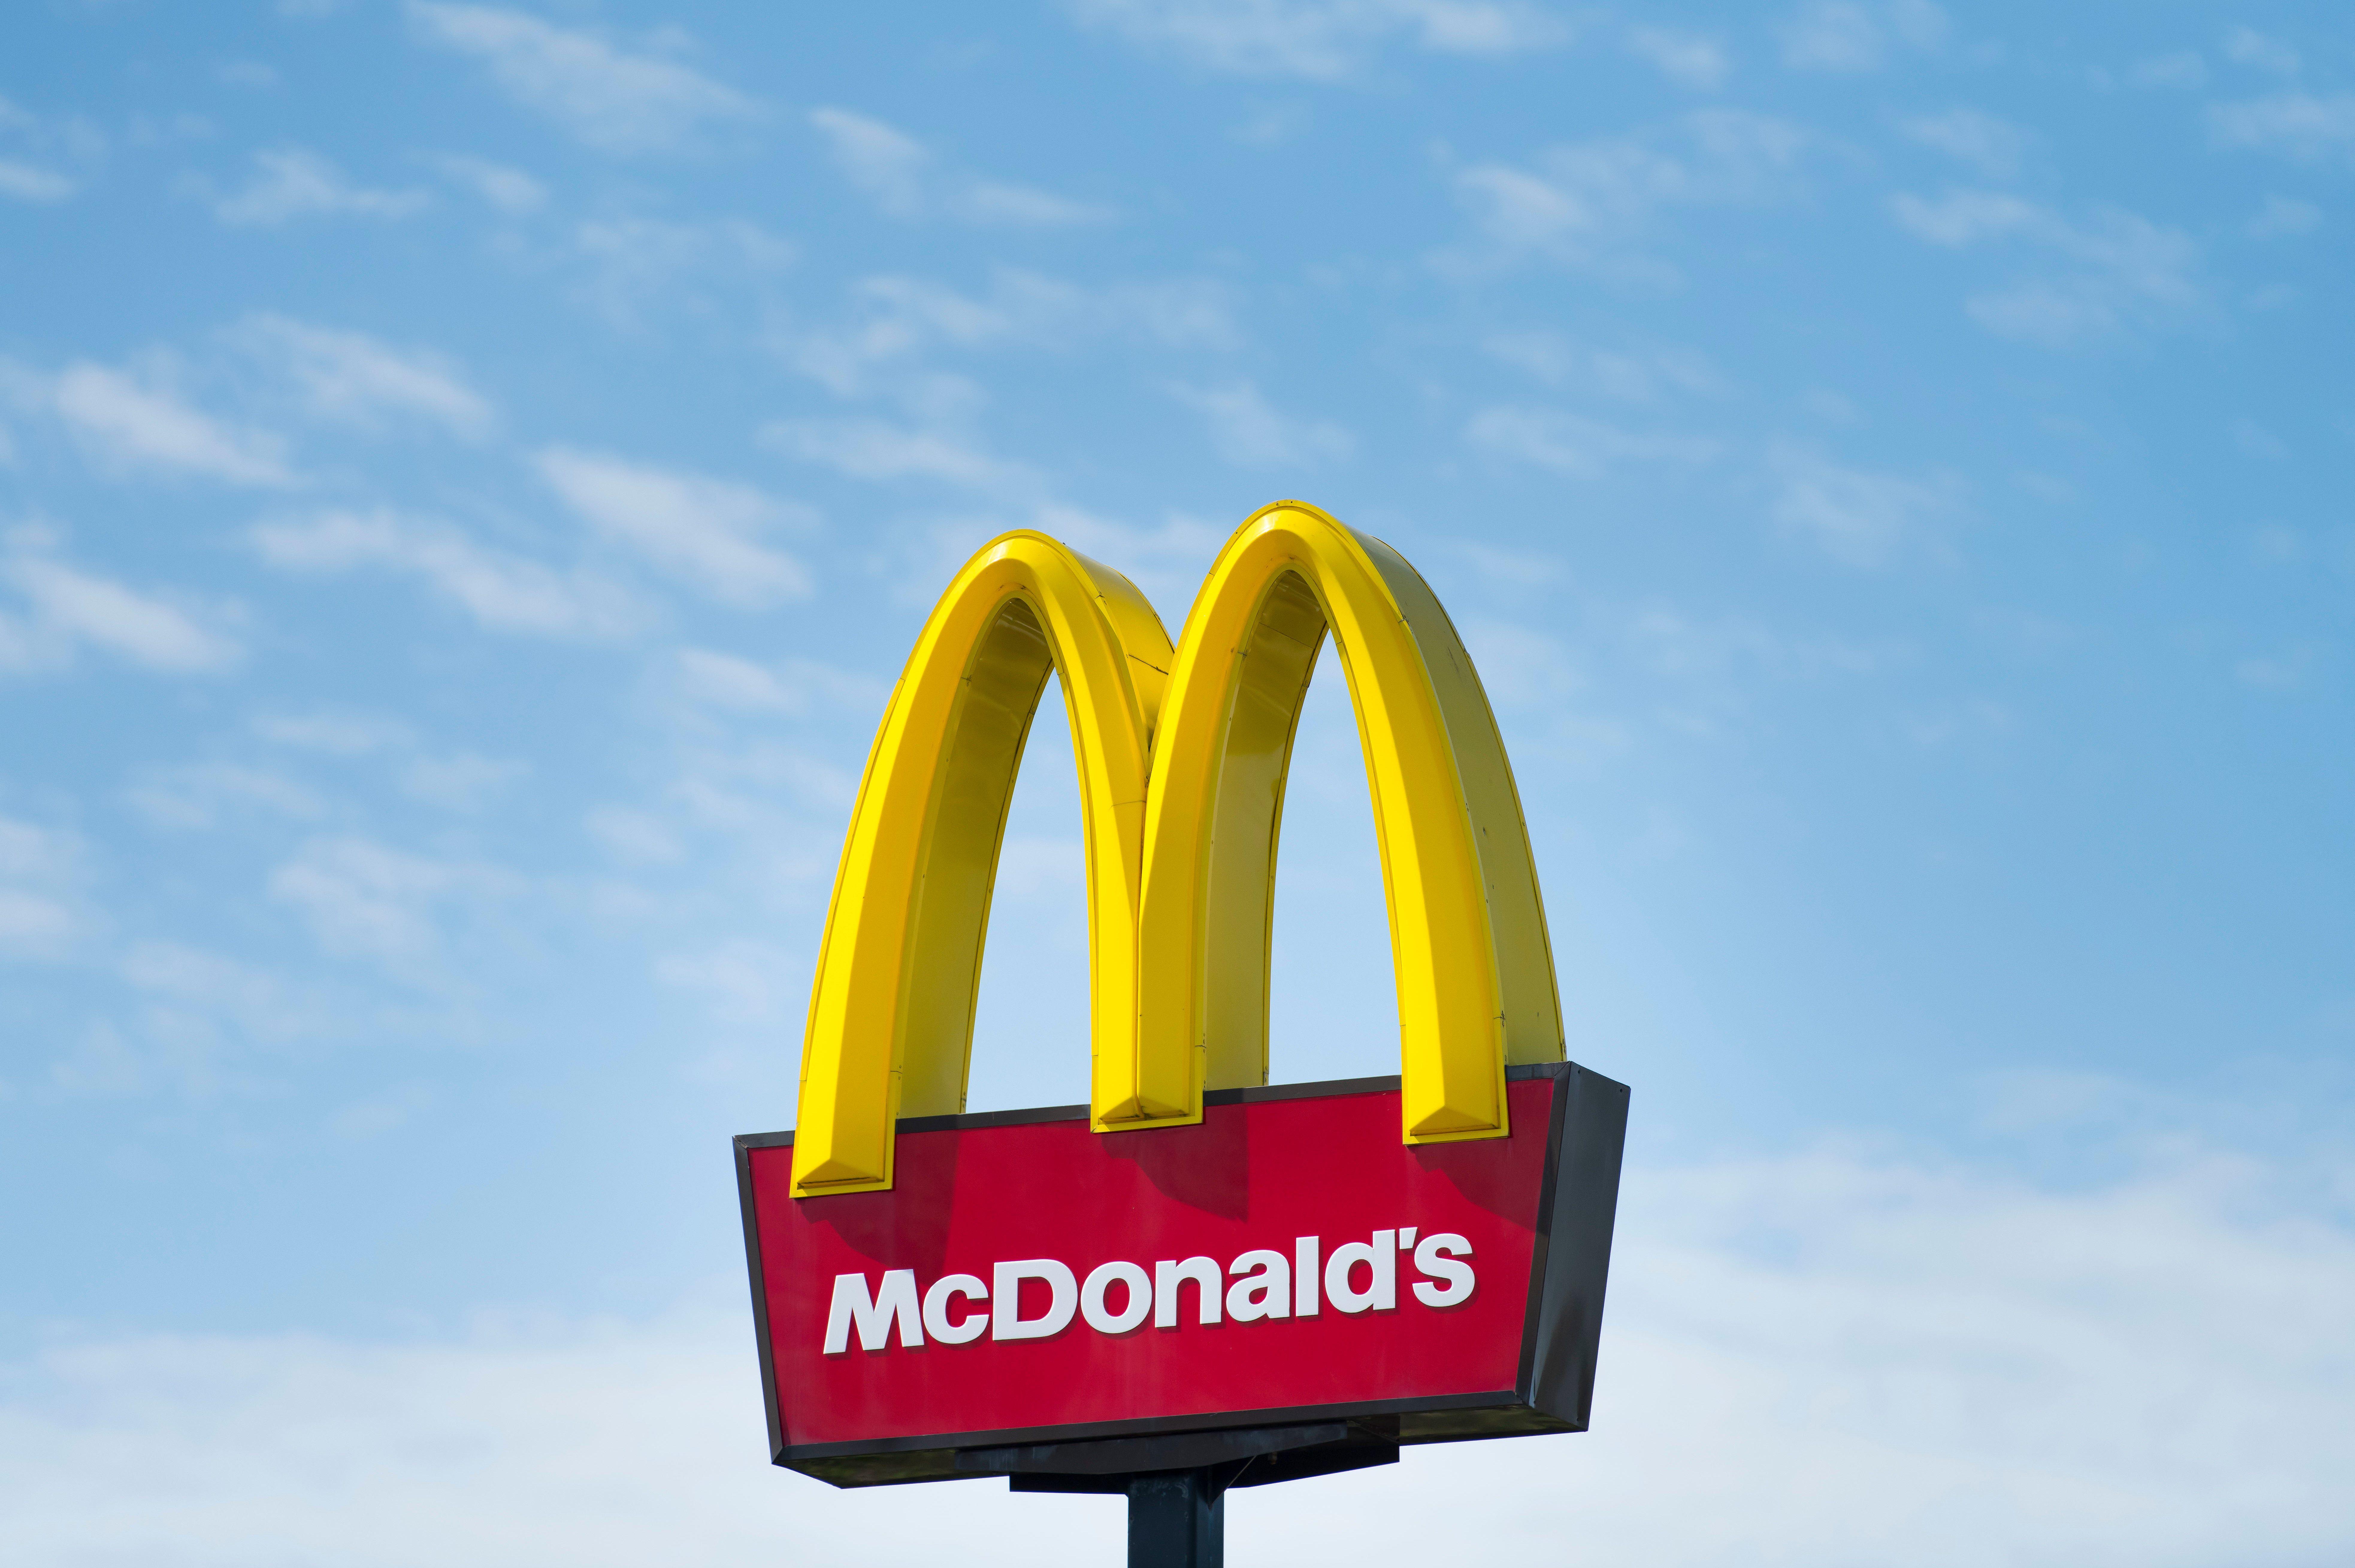 McDonald's Sign